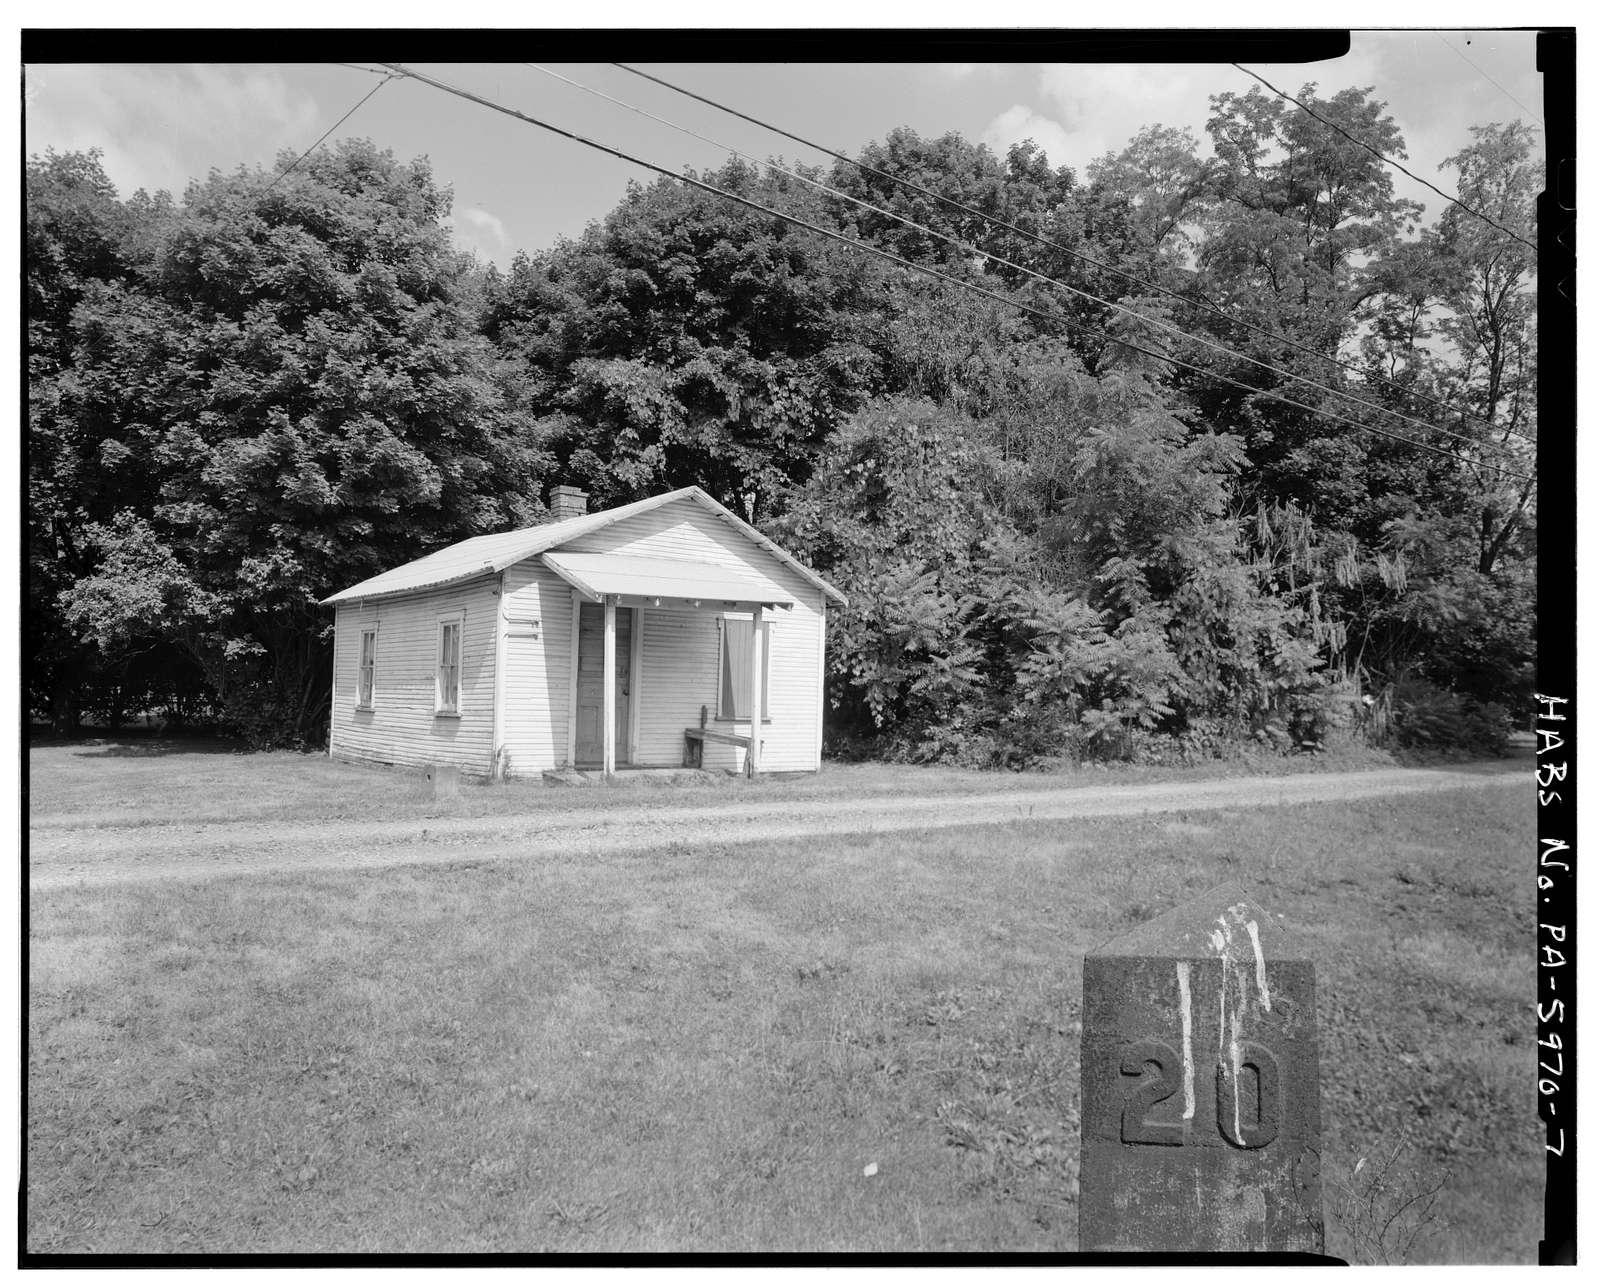 Town of Claysburg, Claysburg, Blair County, PA